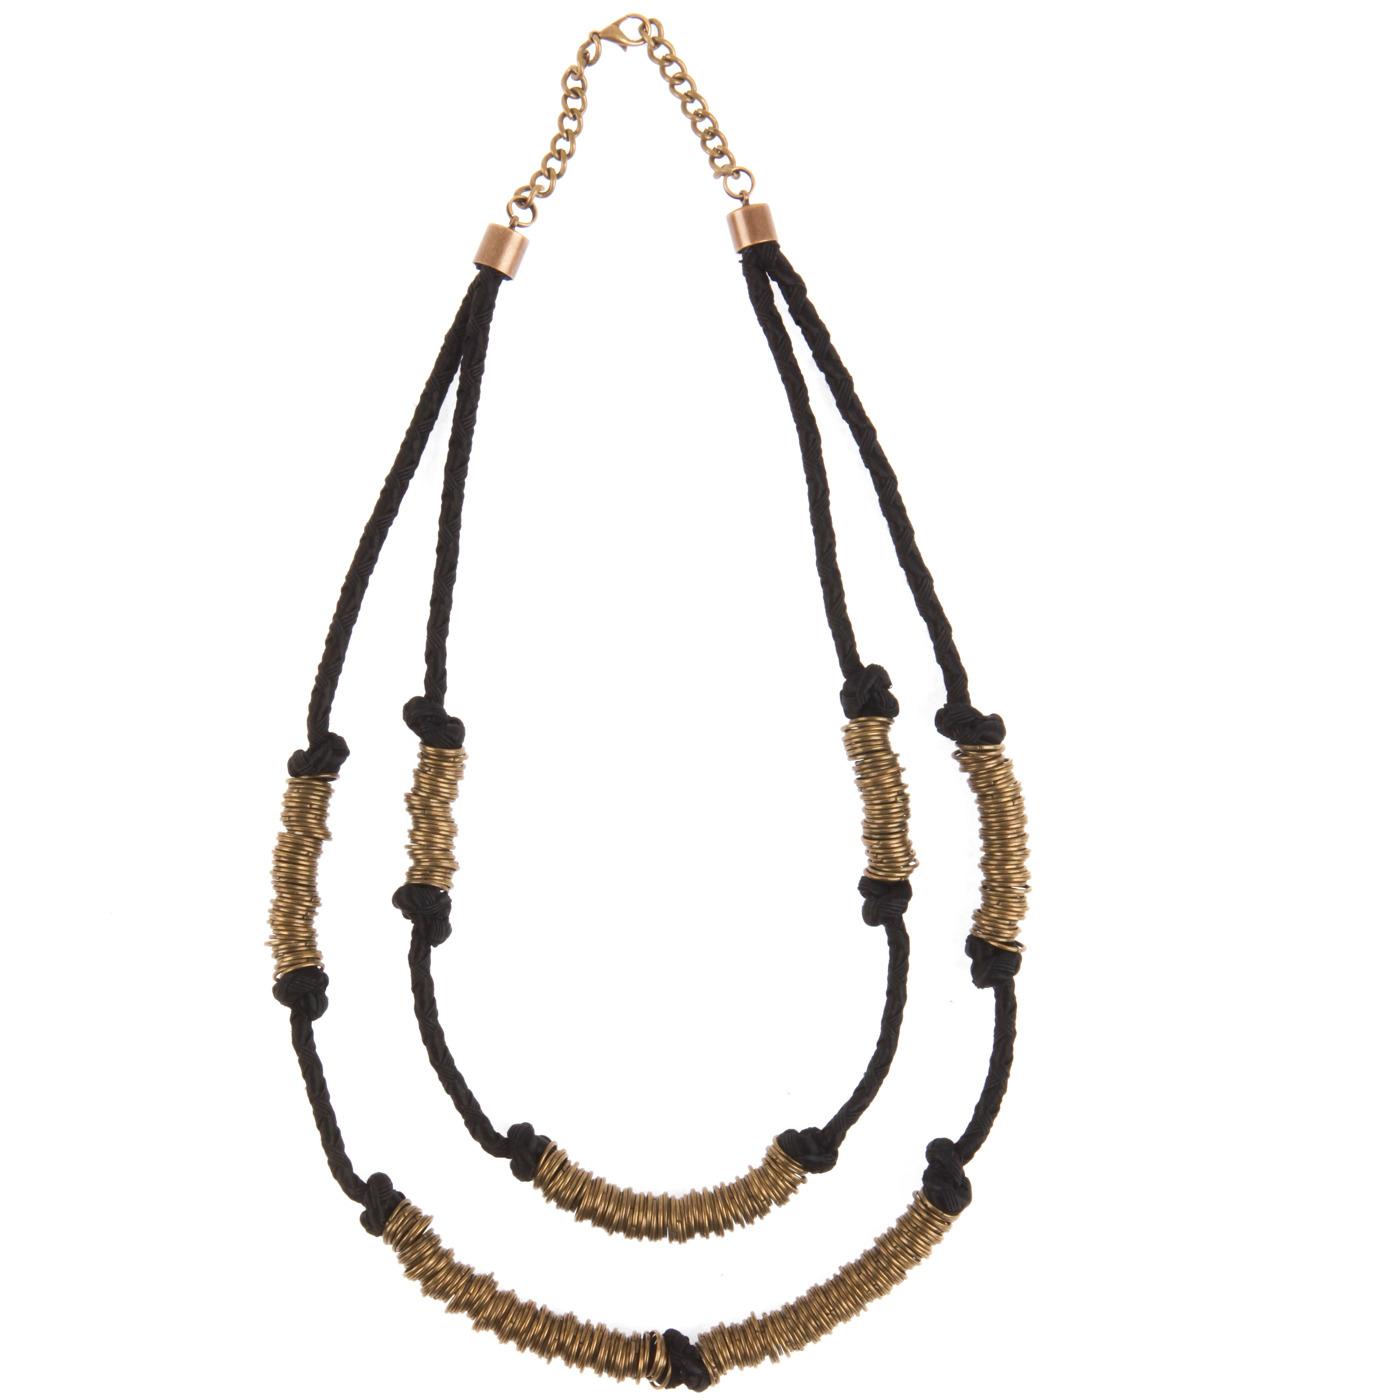 Artisan, Eco-Friendly, Designer Knotical Necklace